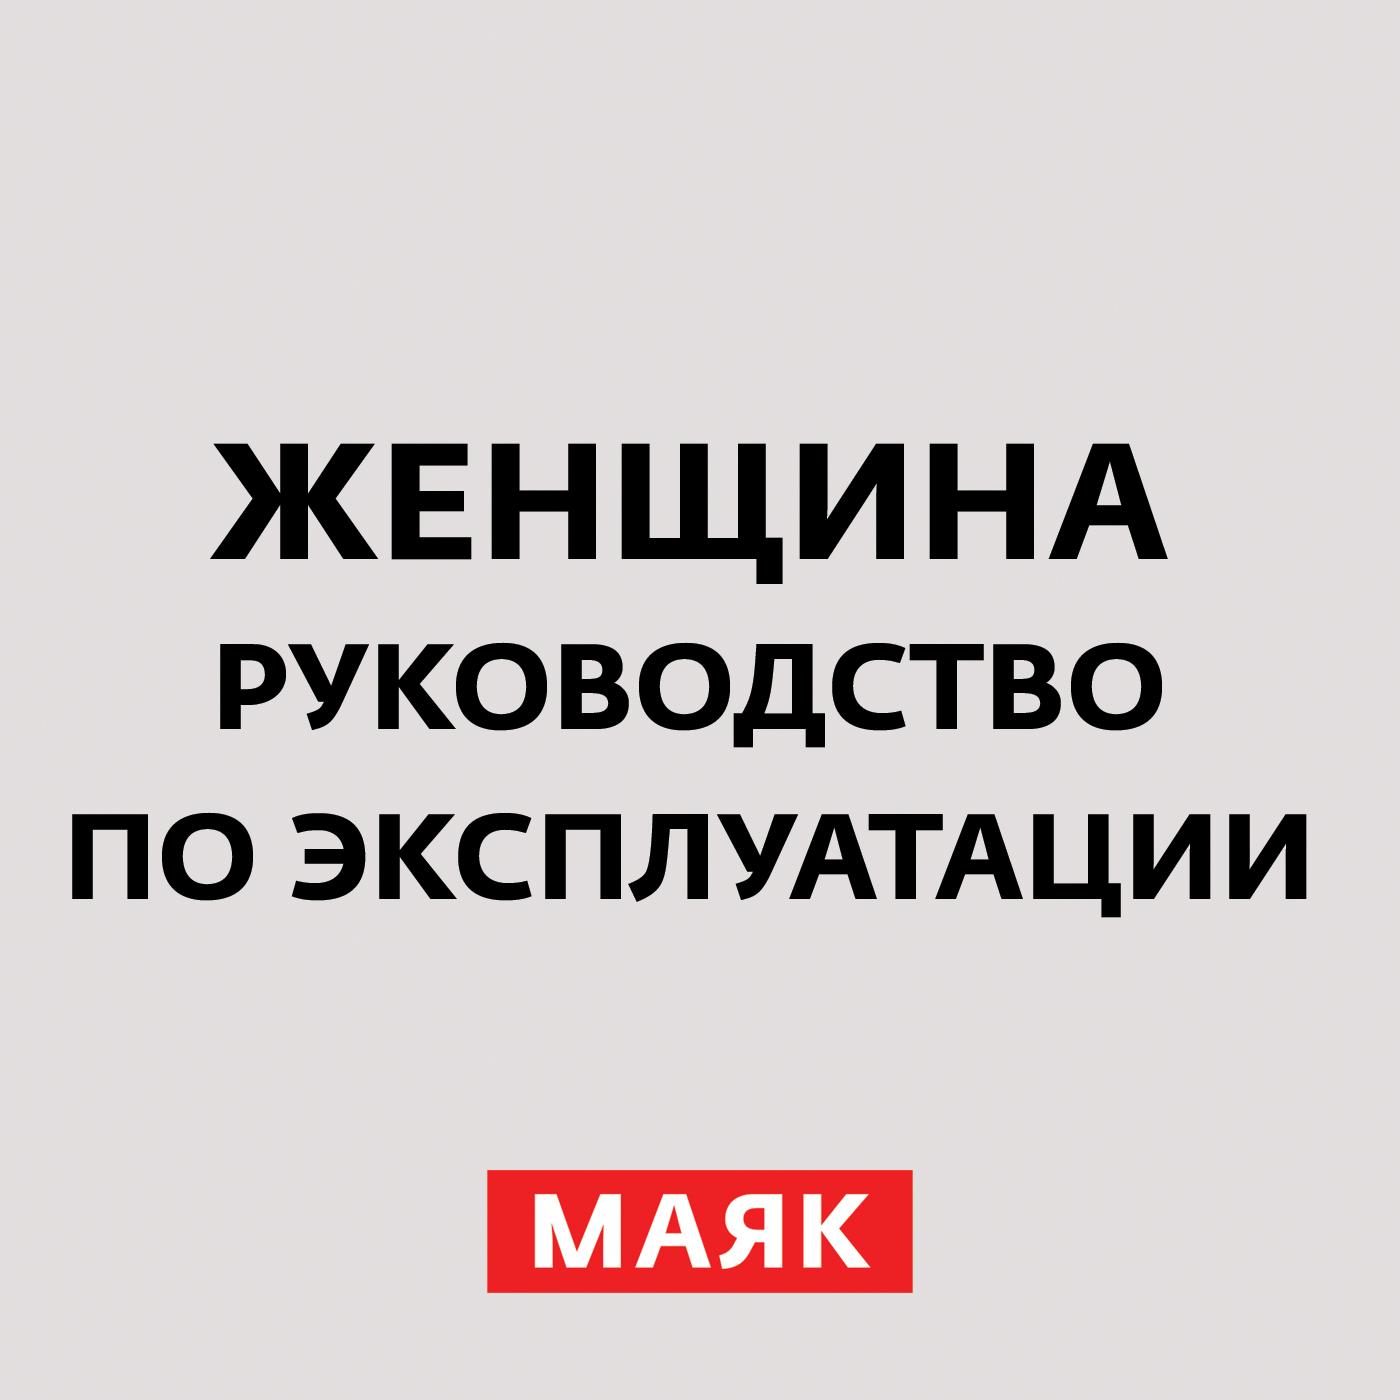 Творческий коллектив радио «Маяк» Неженские профессии творческий коллектив радио маяк теща